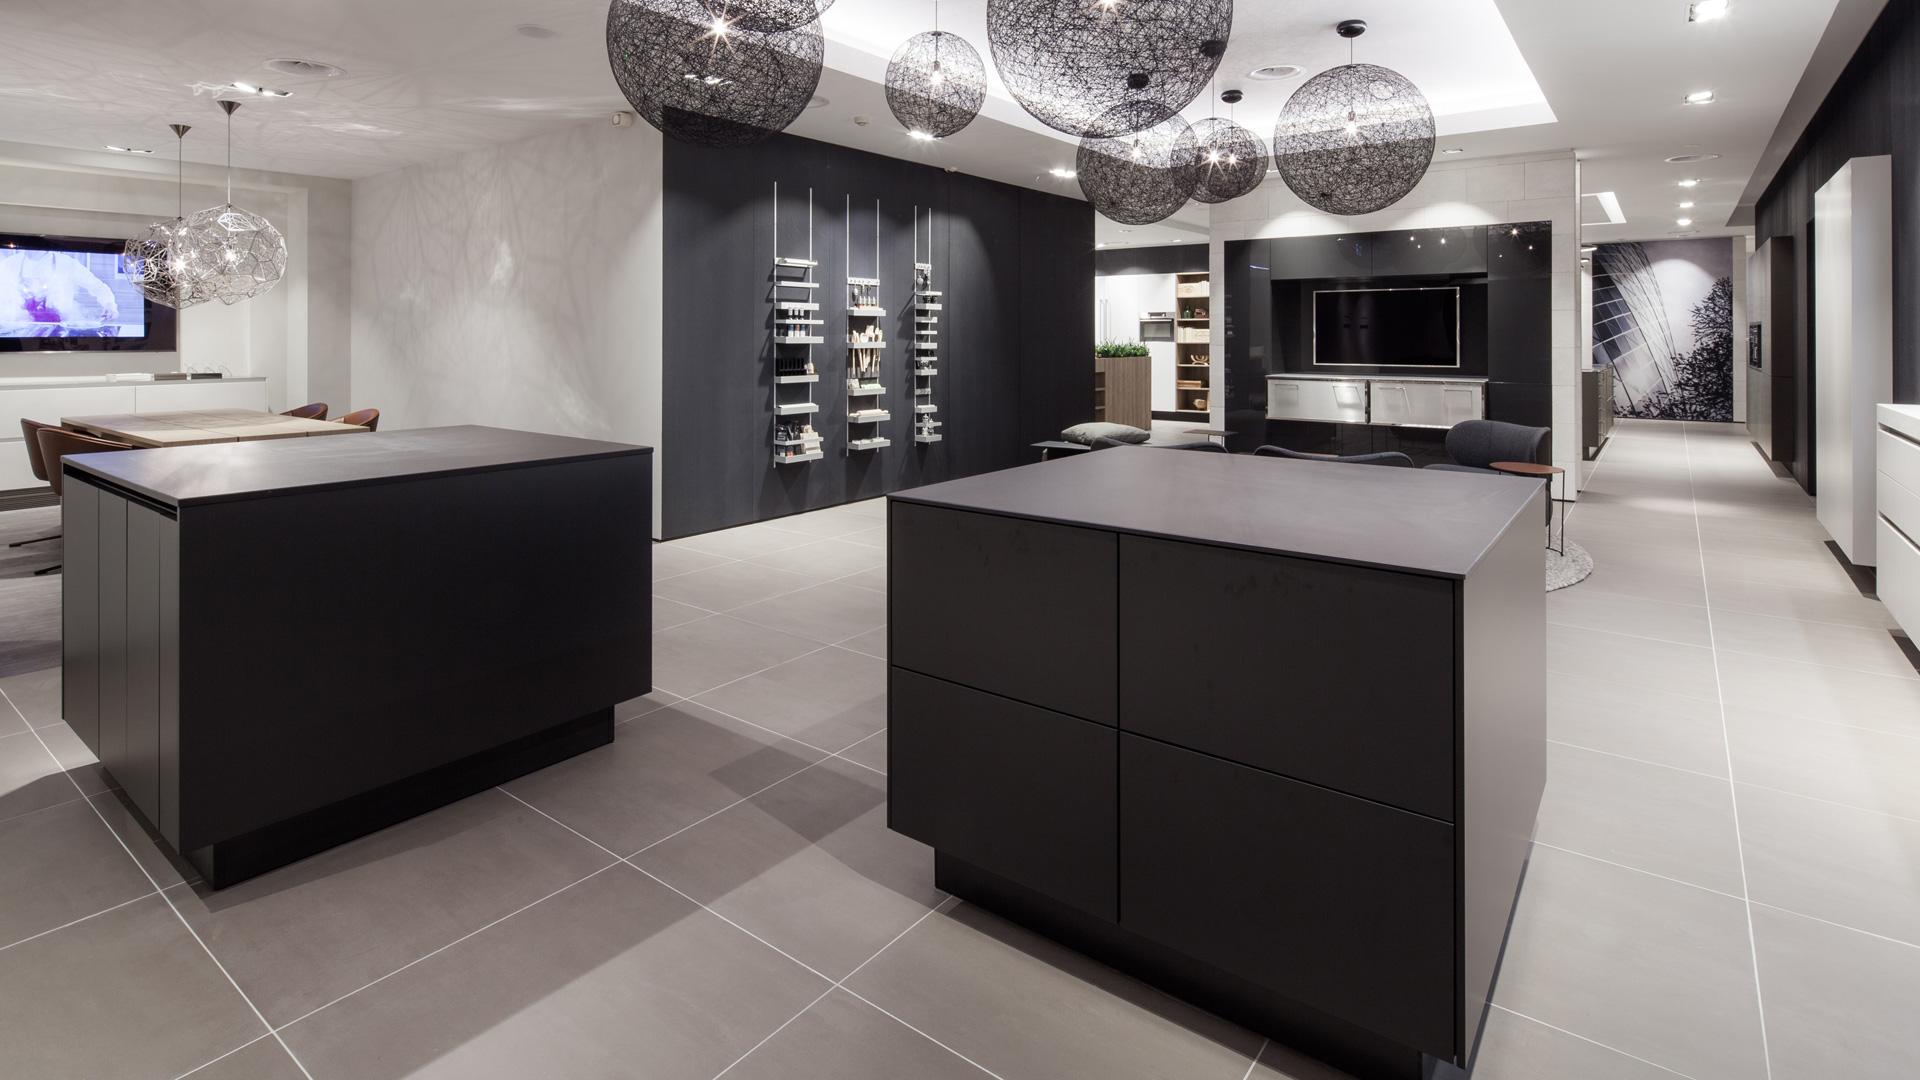 siematic image store in limburg. Black Bedroom Furniture Sets. Home Design Ideas